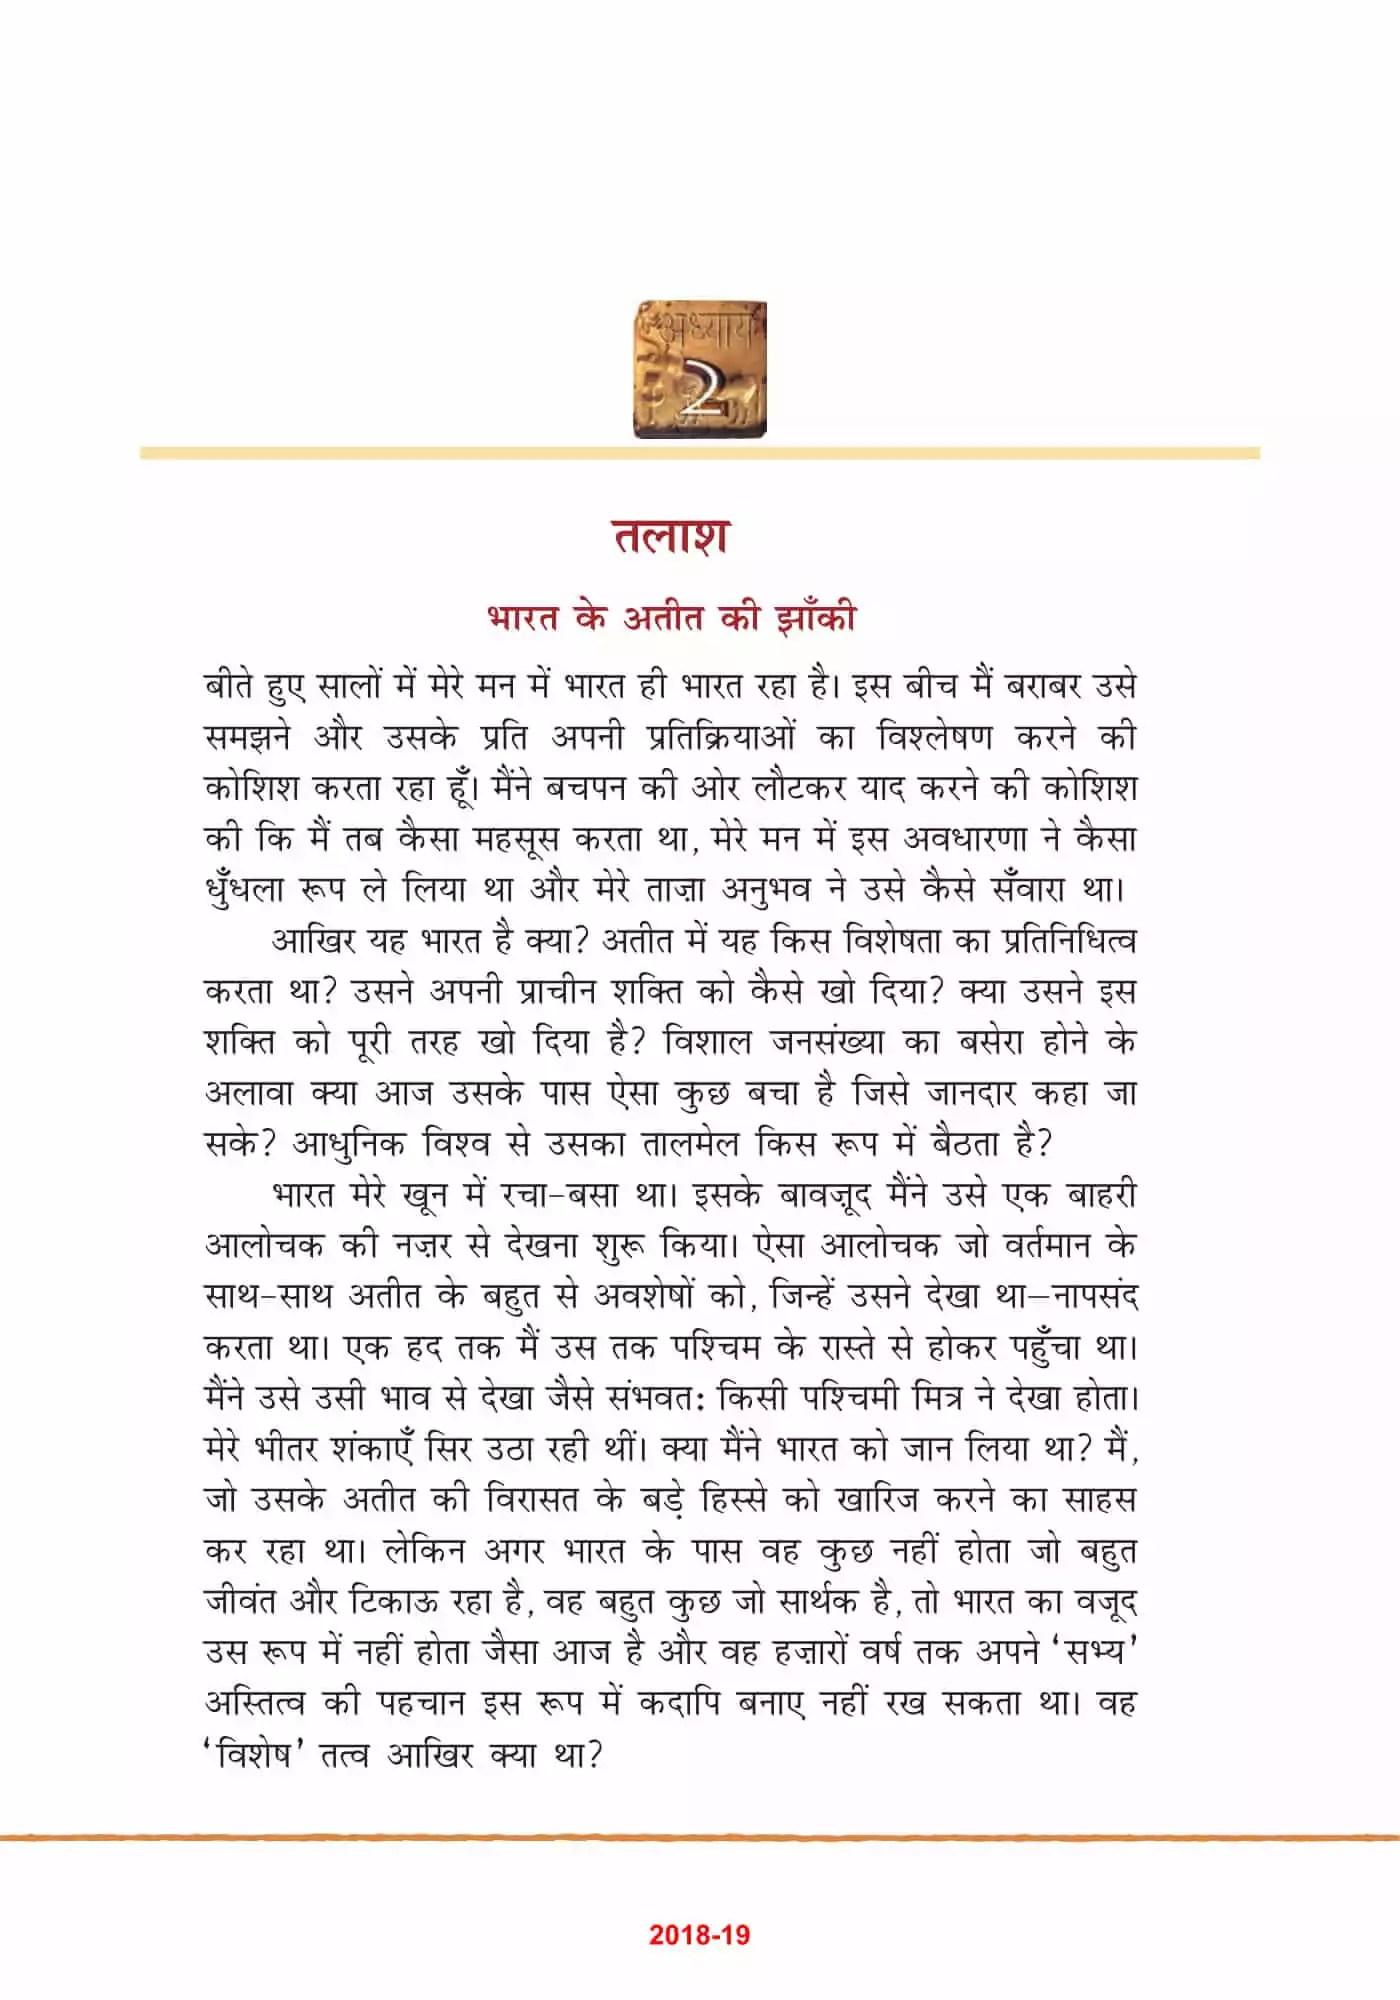 NCERT Solutions For Class 8 Hindi Bharat Ki Khoj Chapter 2